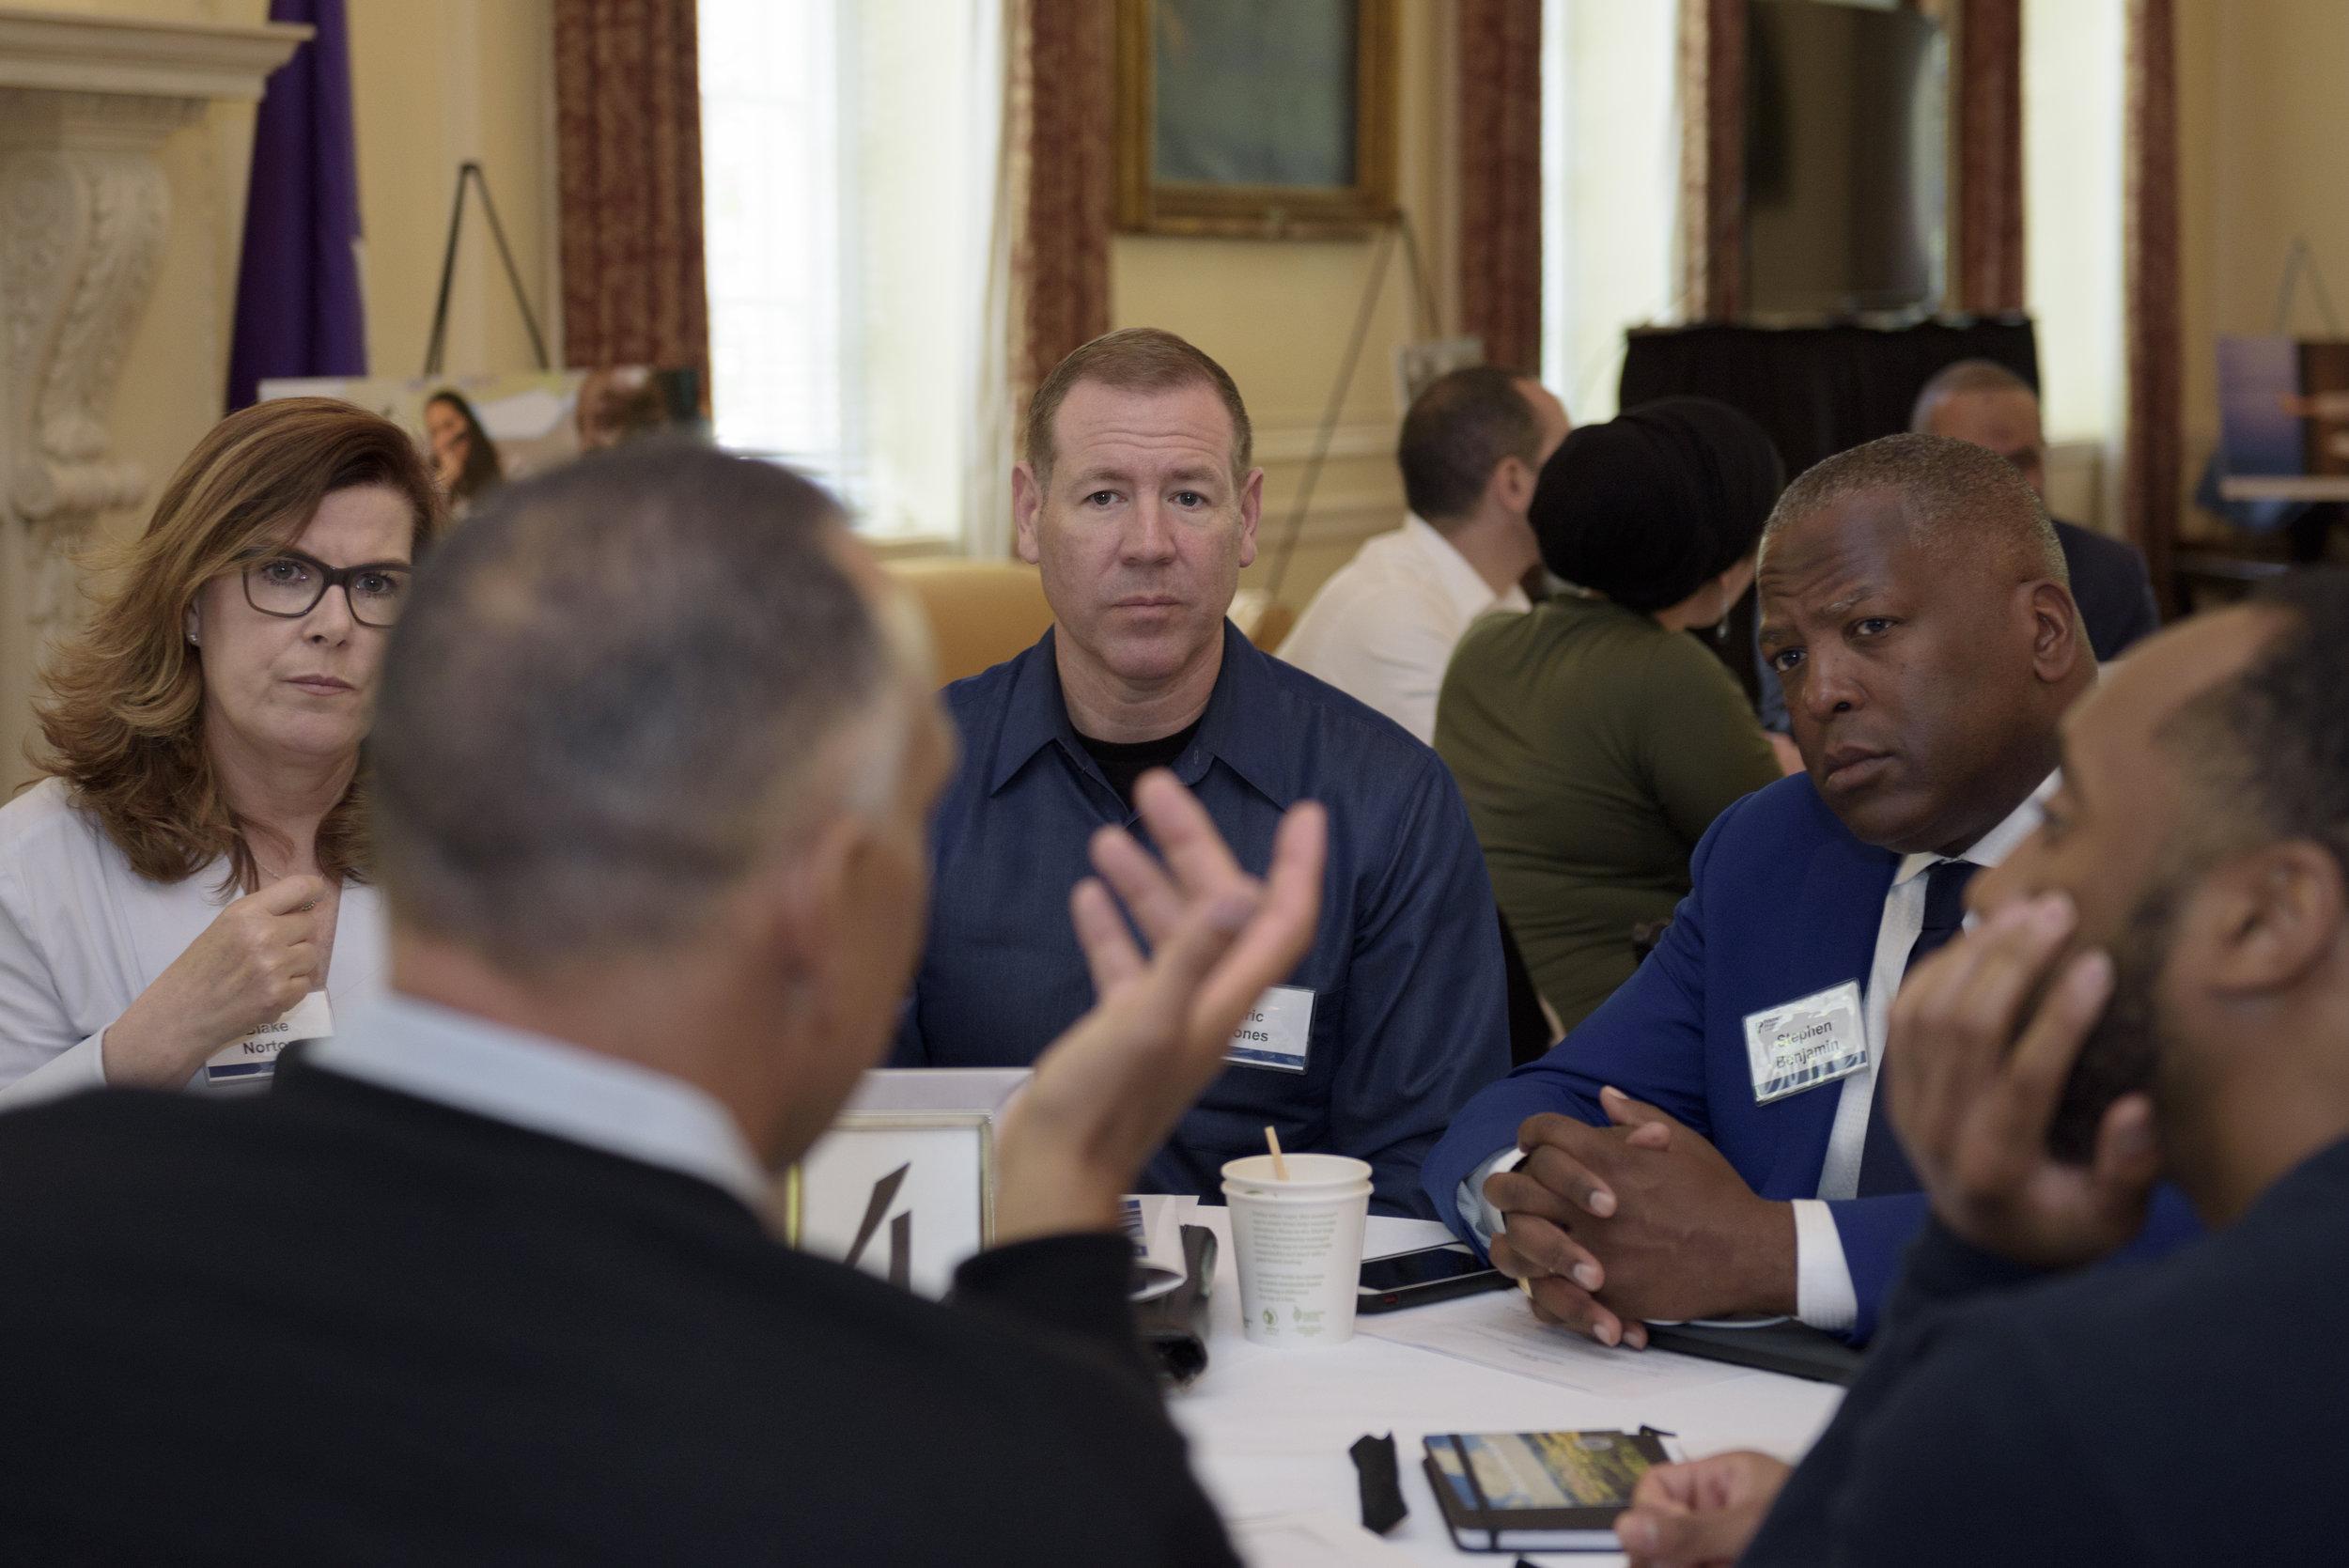 (From left) Blake Norton, senior vice president of the National Police Foundation; Stockton Chief of Police Eric Jones; and Mayor Stephen Benjamin of Columbia, South Carolina.